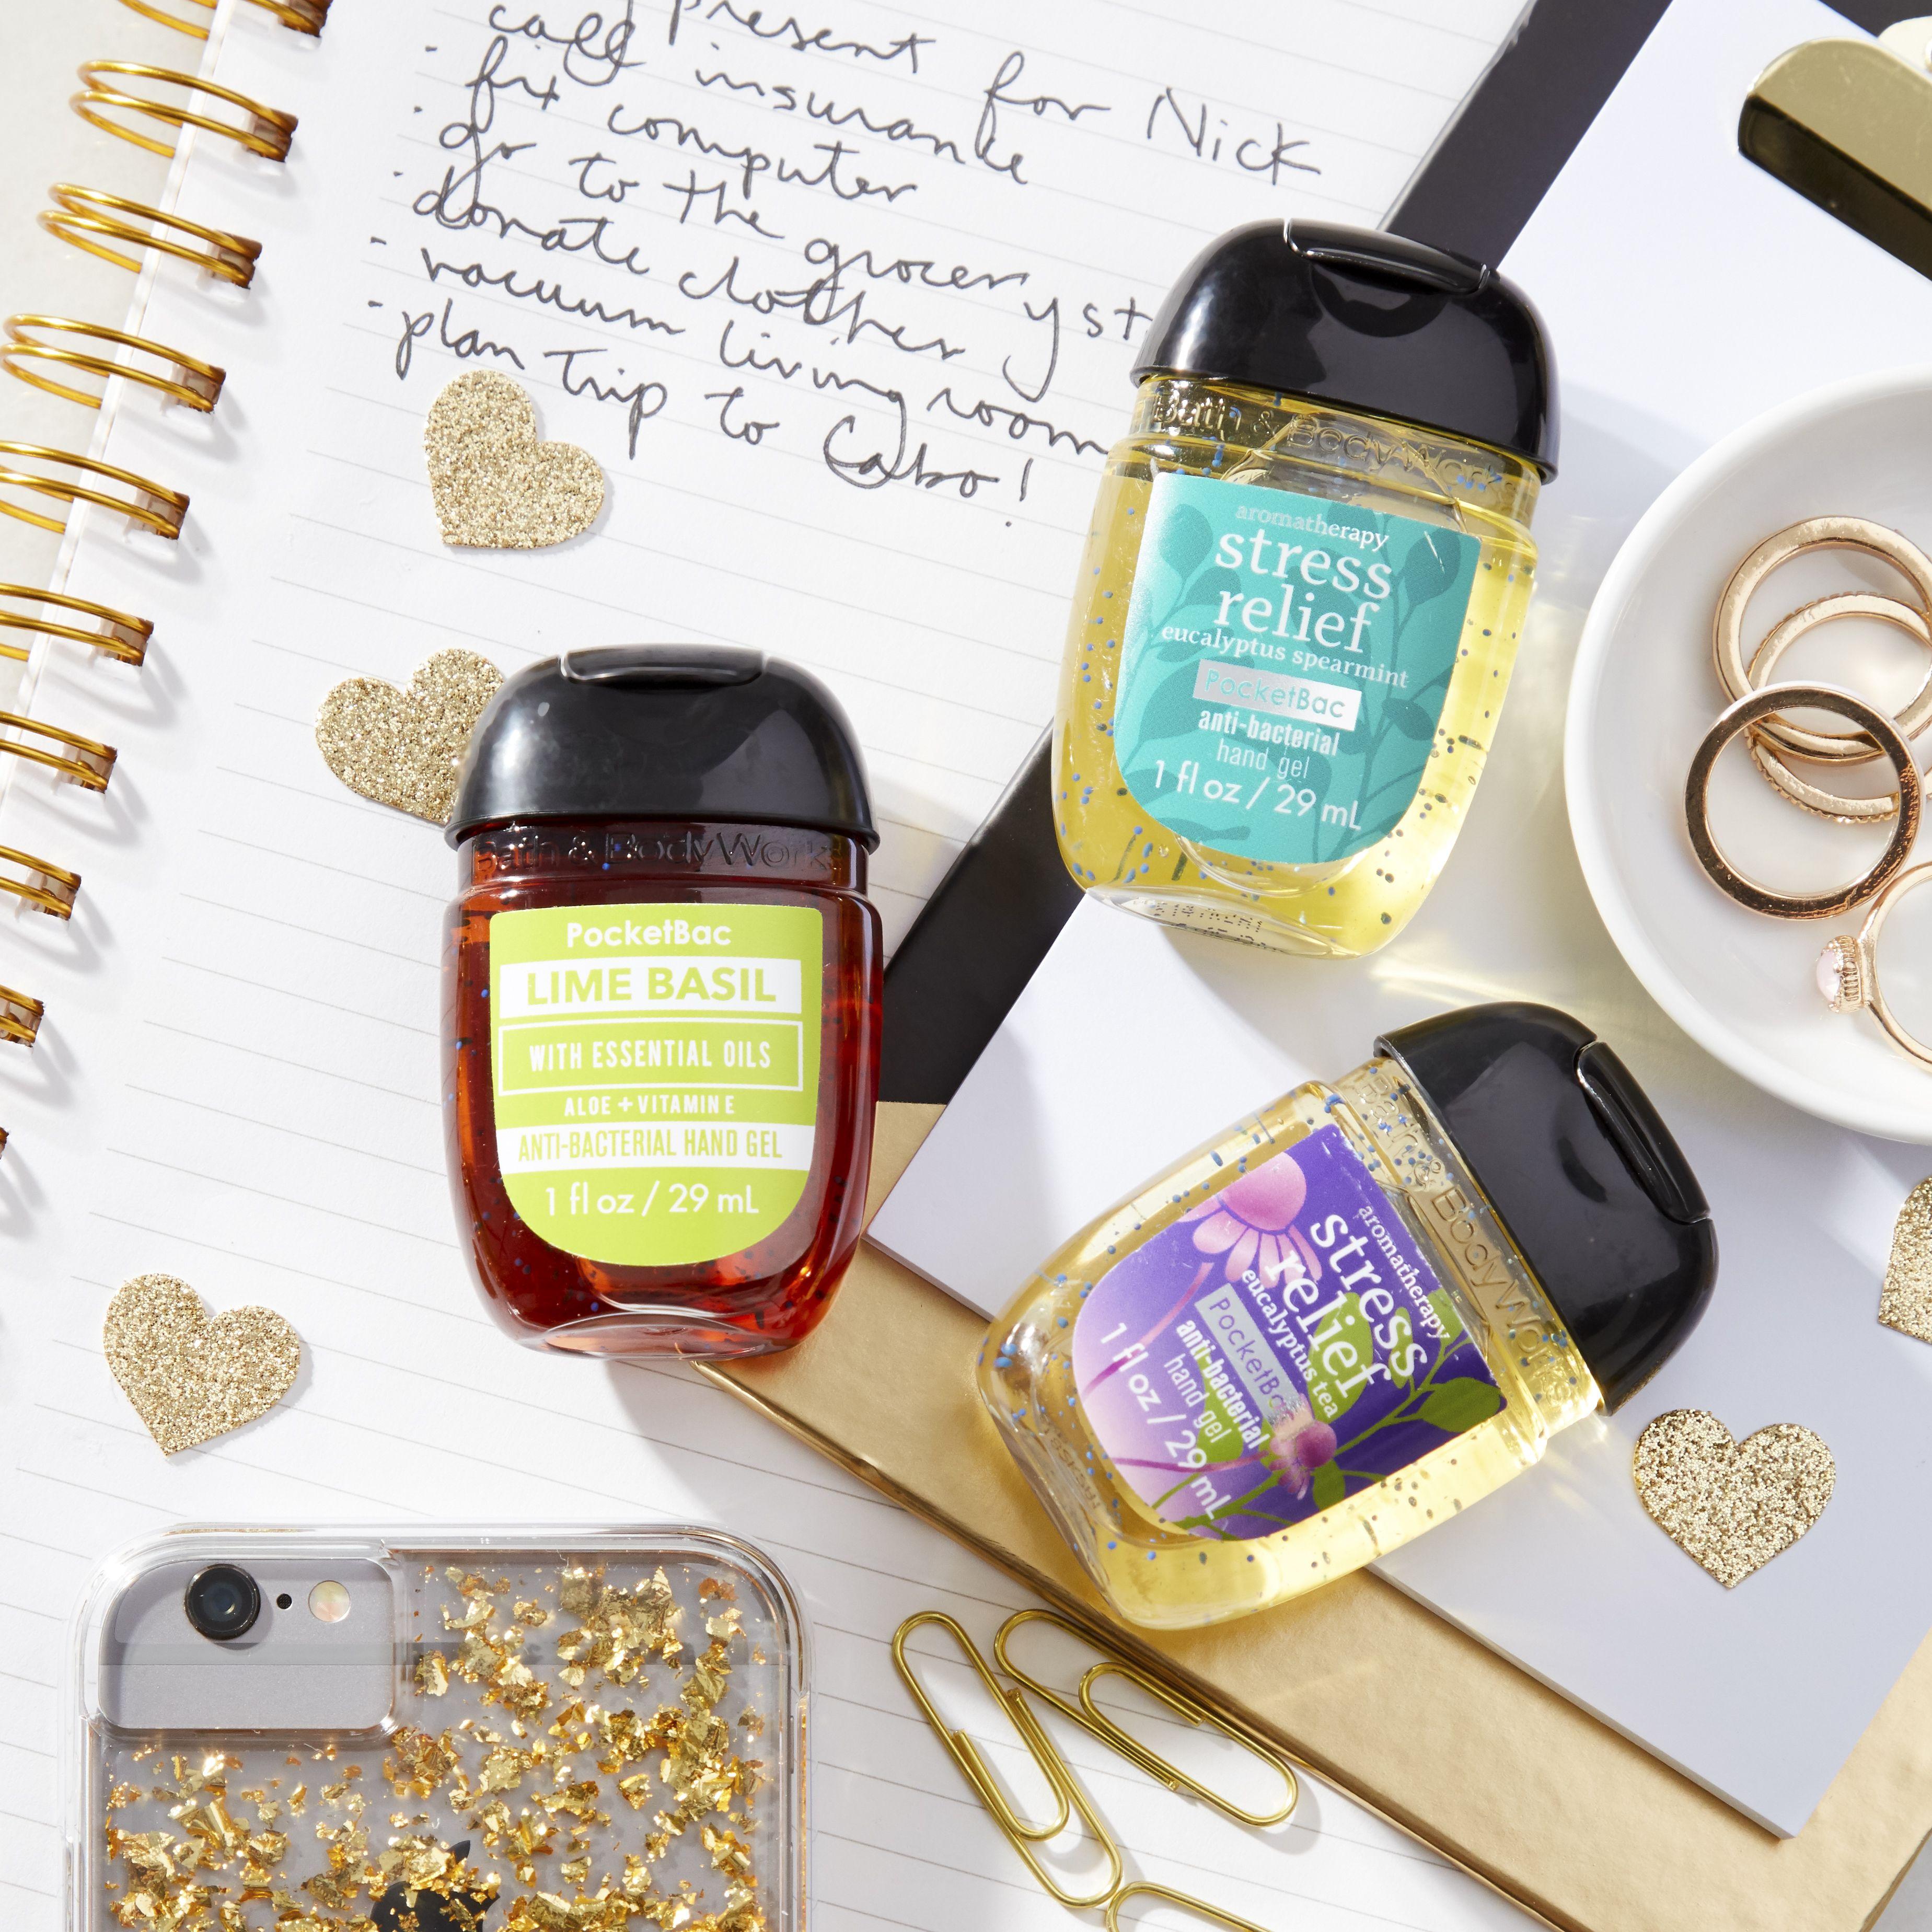 Pocketbacs With Essential Oils Bath And Body Body Works